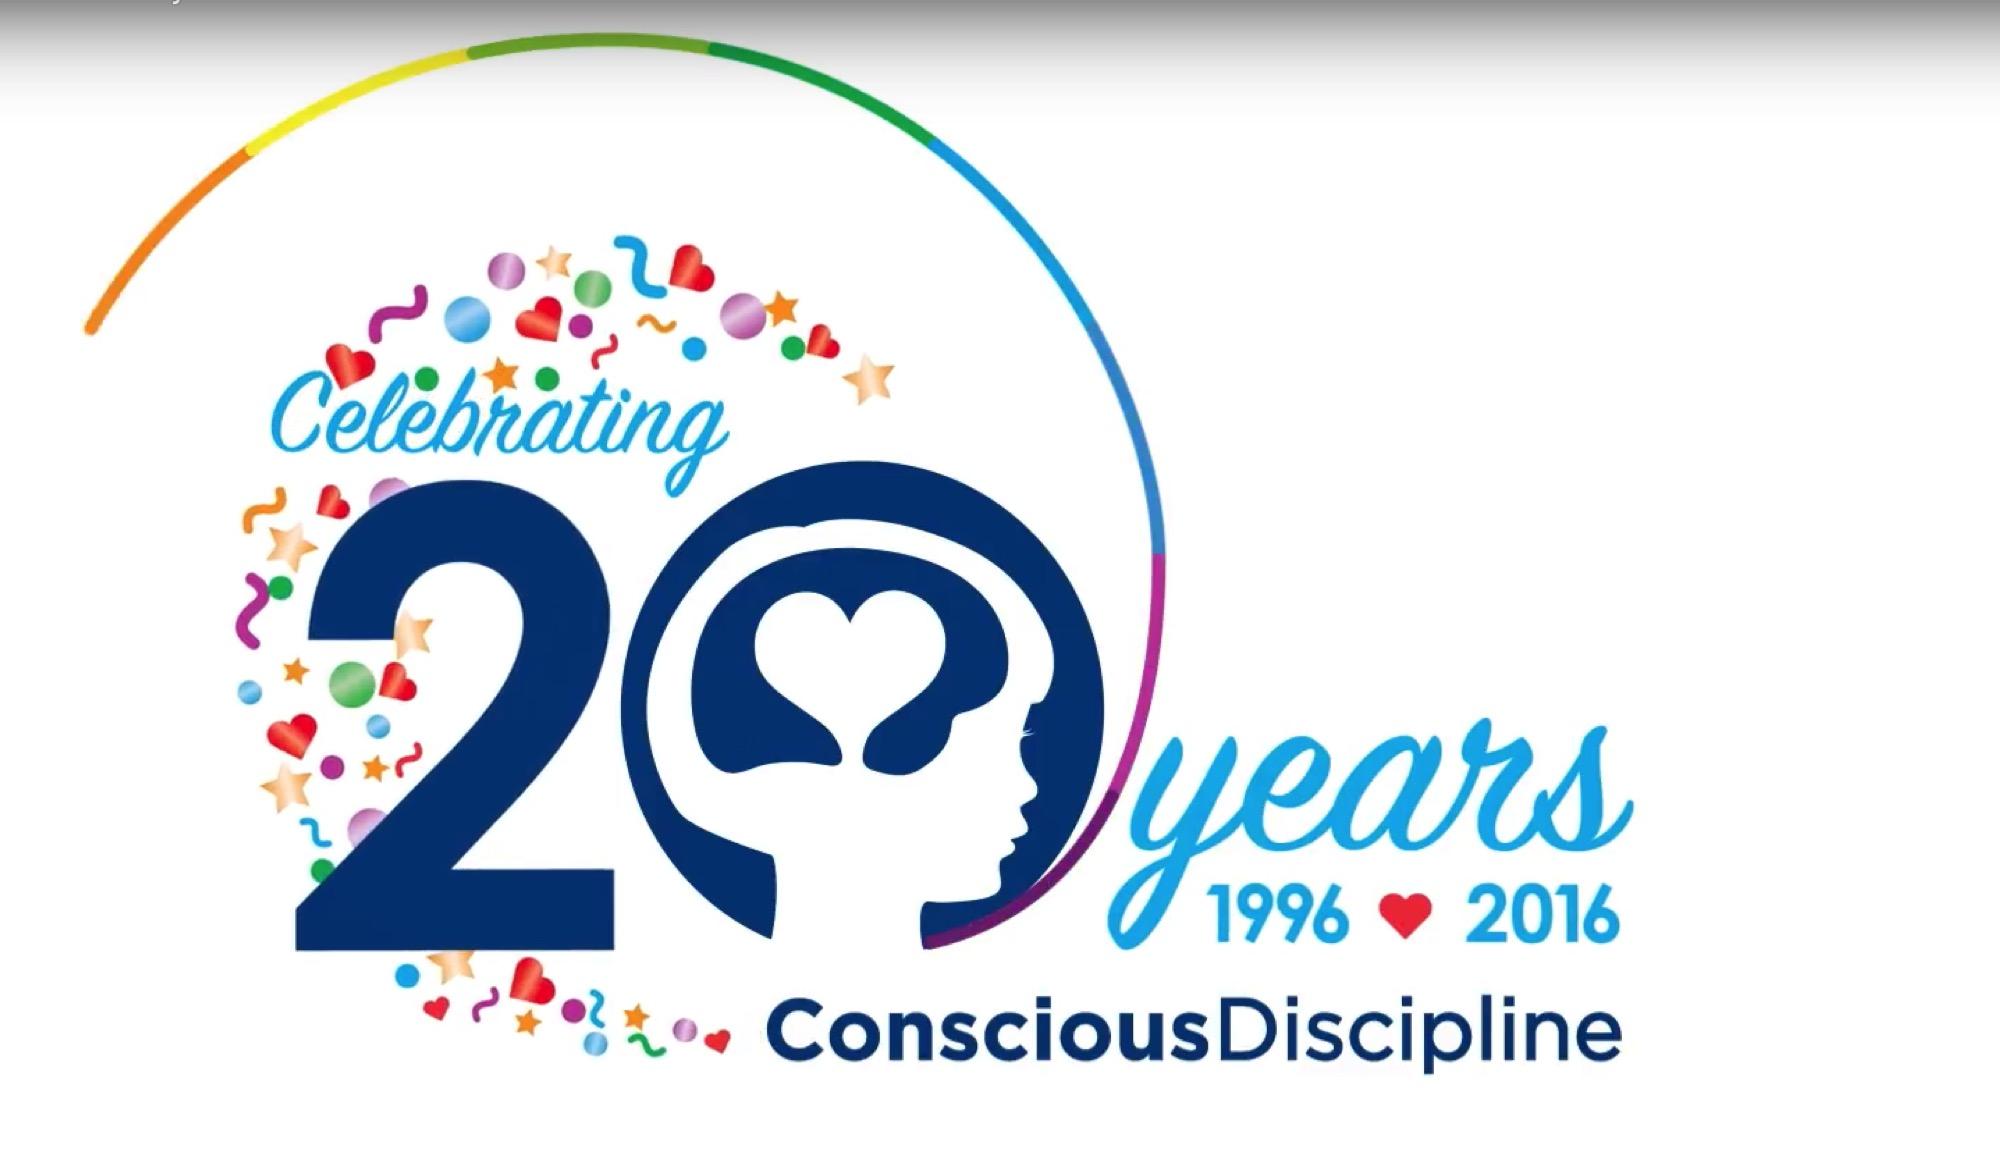 Conscious Discipline Celebrates 20 Years